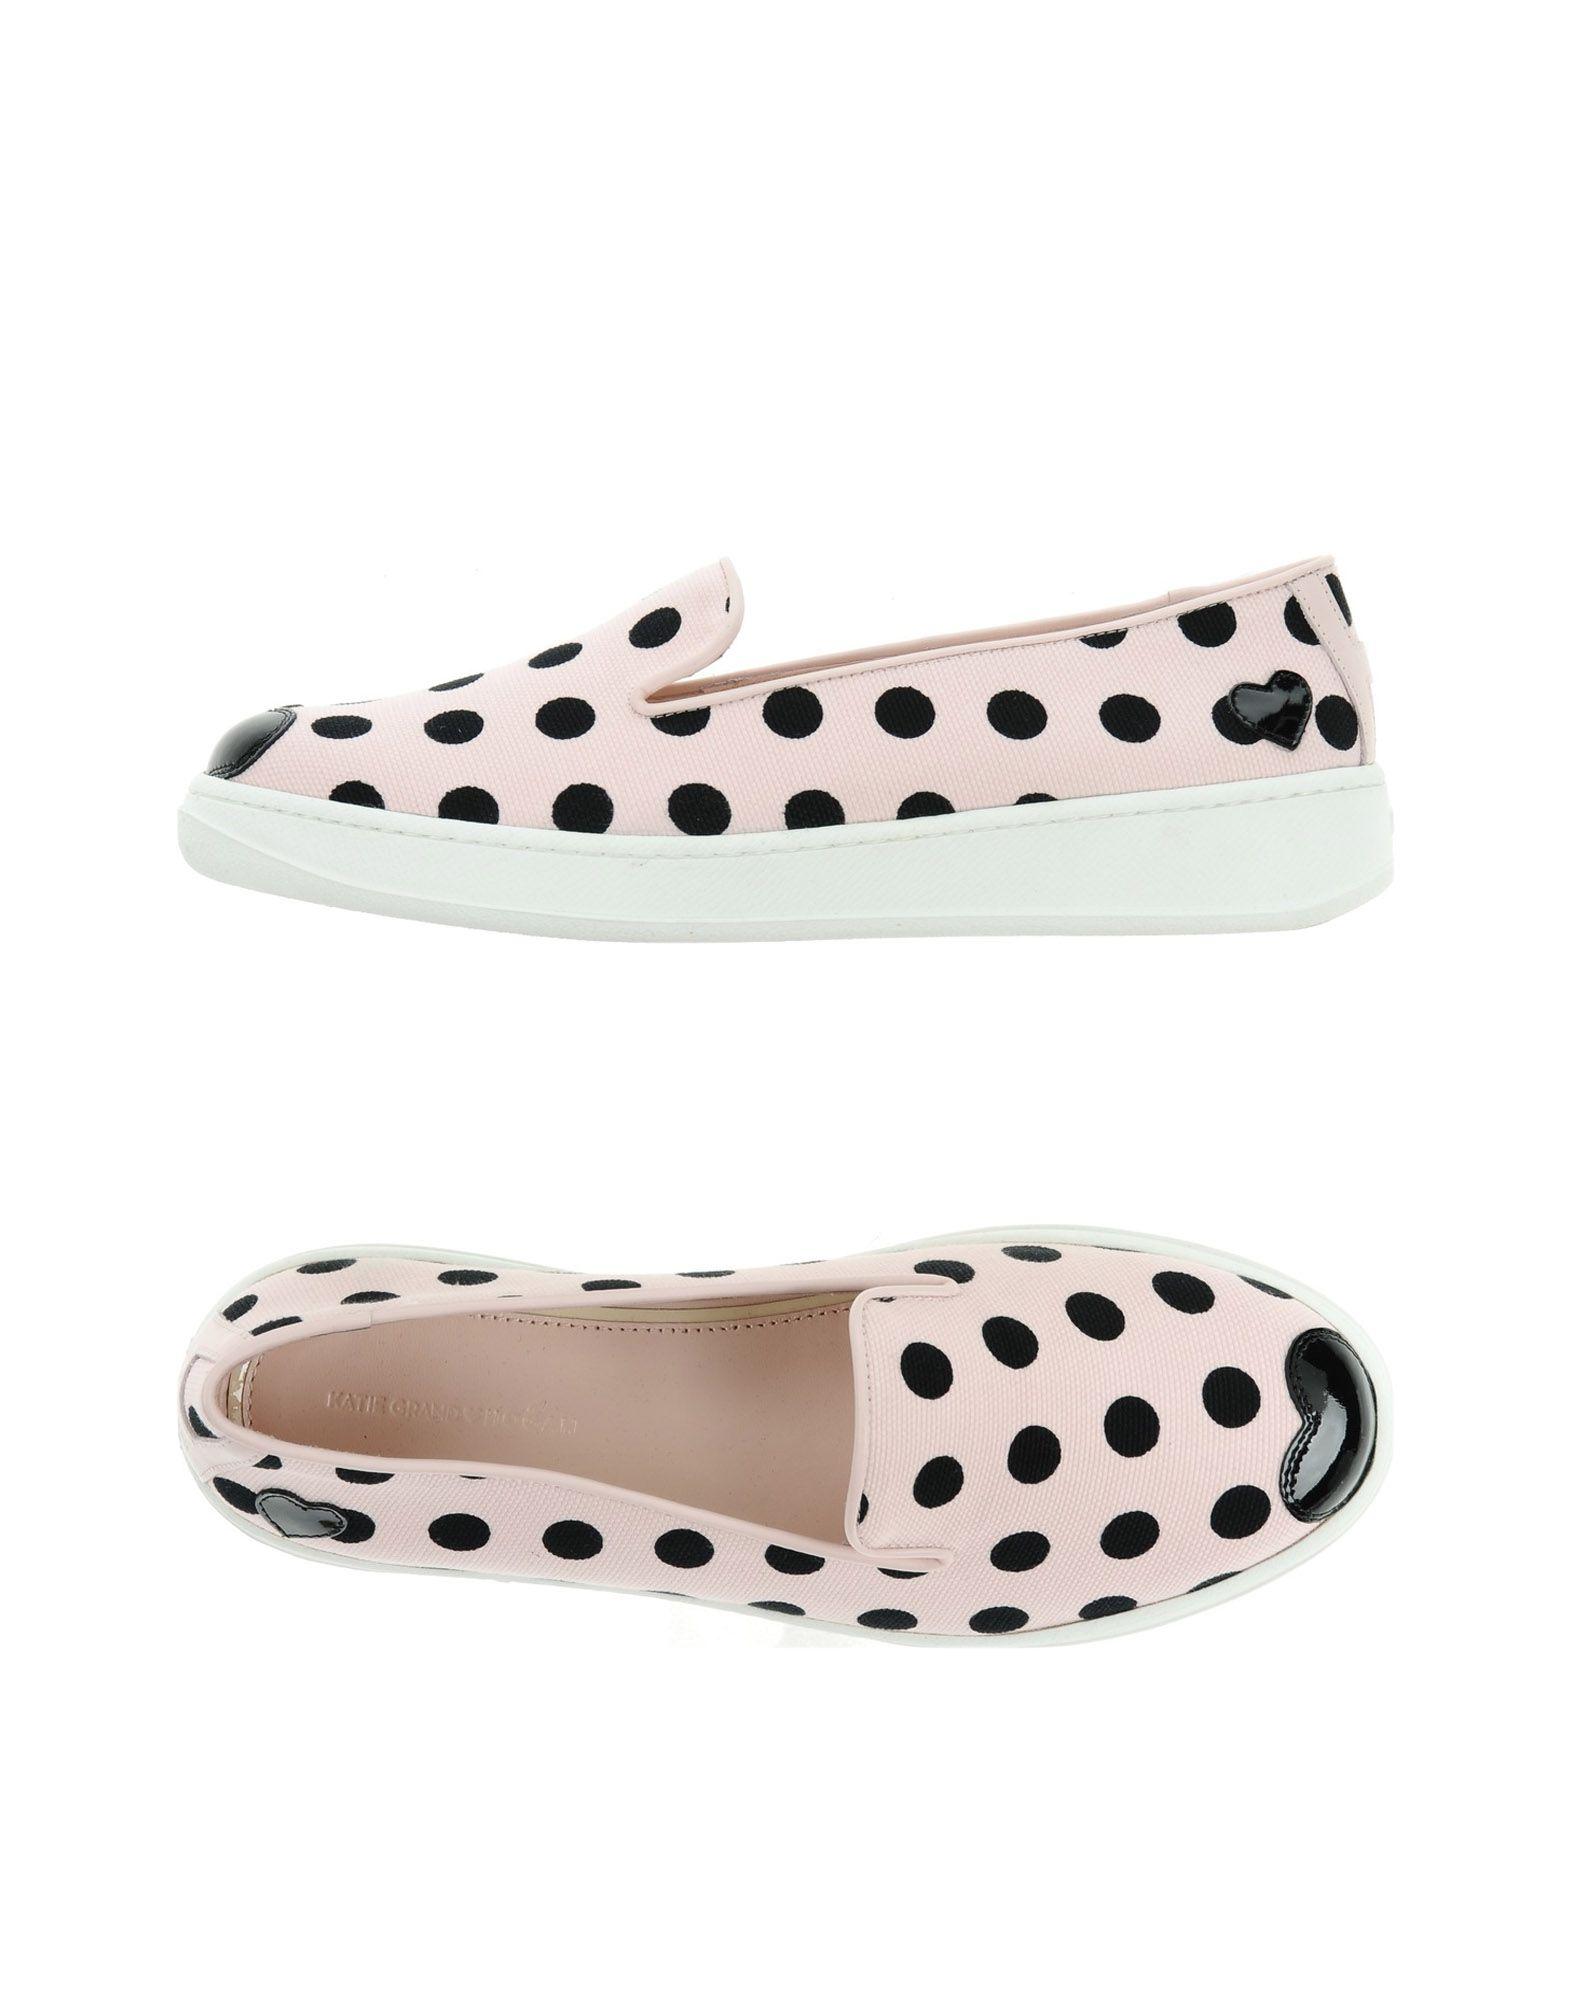 Katie Grand Loves Hogan Sneakers Damen  11335647JN Gute Qualität beliebte Schuhe